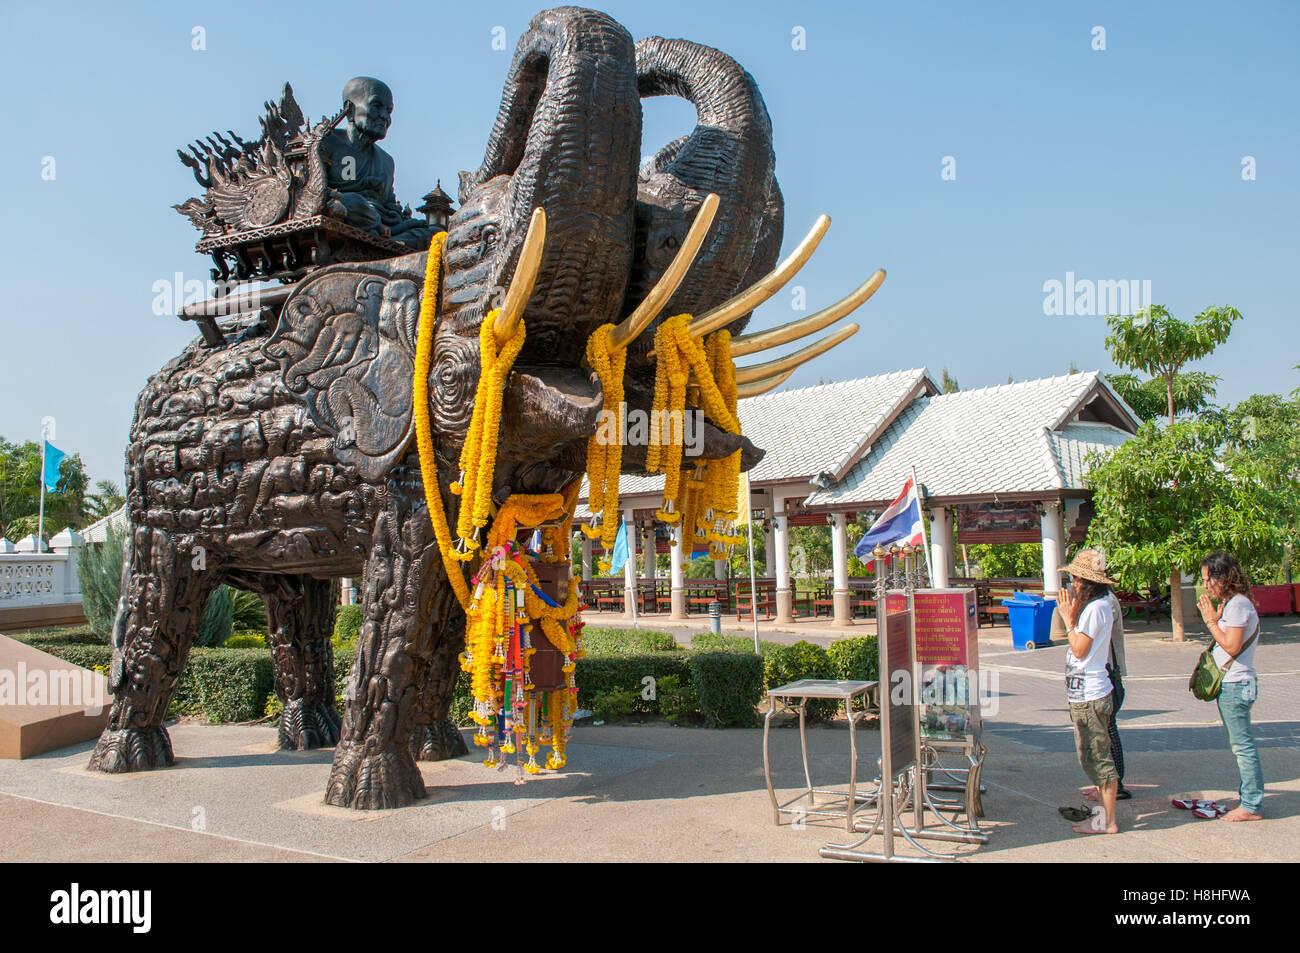 Sculpture of revered Buddhist monk Luang Pu Thuat at Wat Huay Mongkol in Hua Hin Thailand - Stock Image